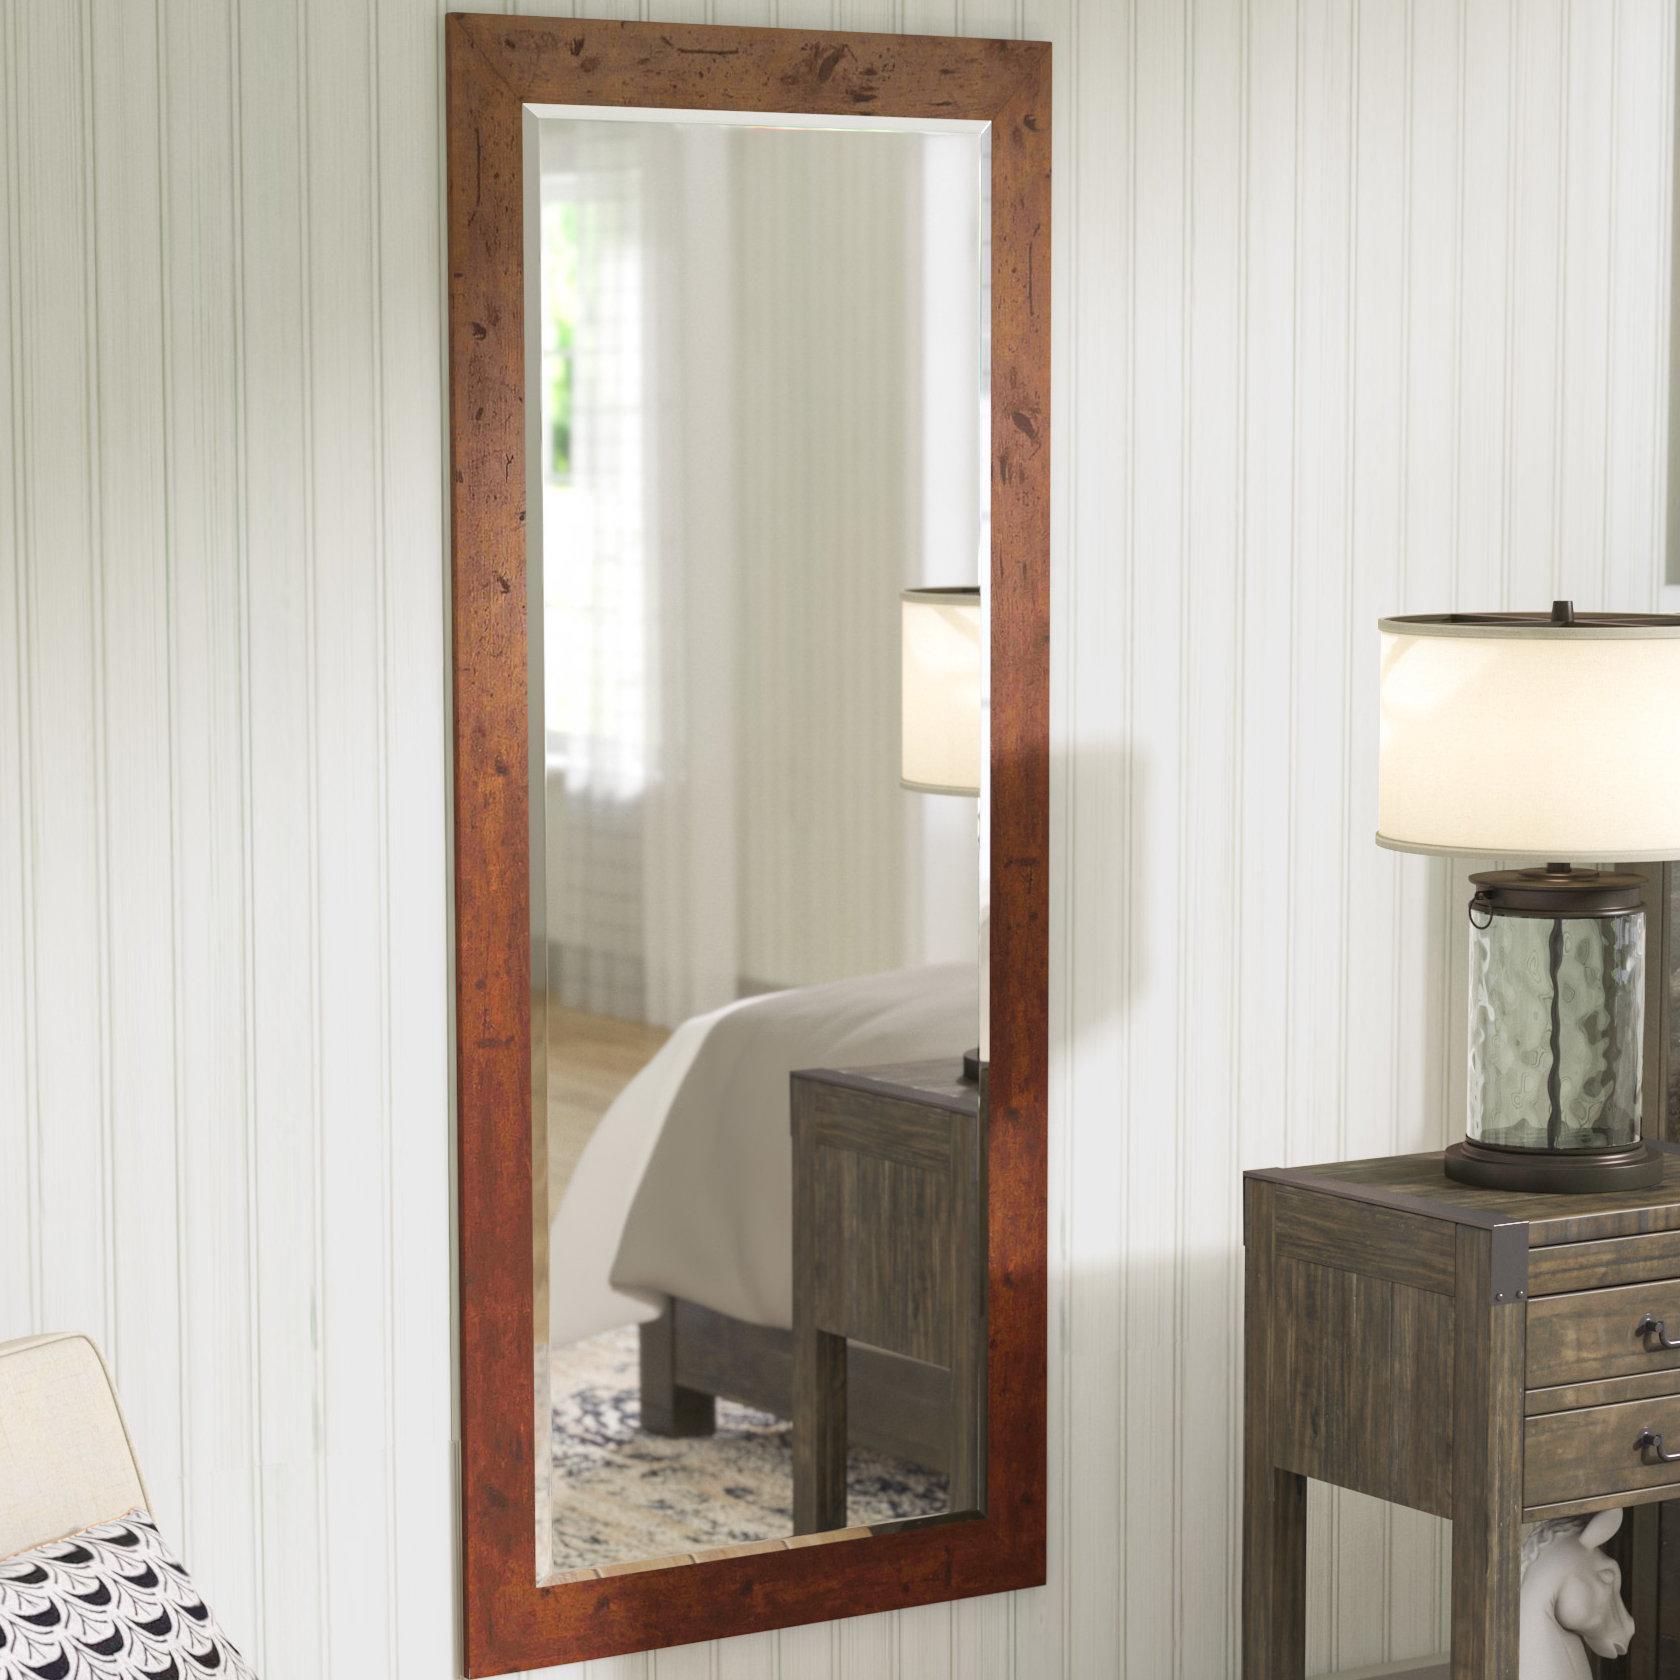 Farmhouse & Rustic Laurel Foundry Modern Farmhouse Wall Regarding Peetz Modern Rustic Accent Mirrors (Image 3 of 20)